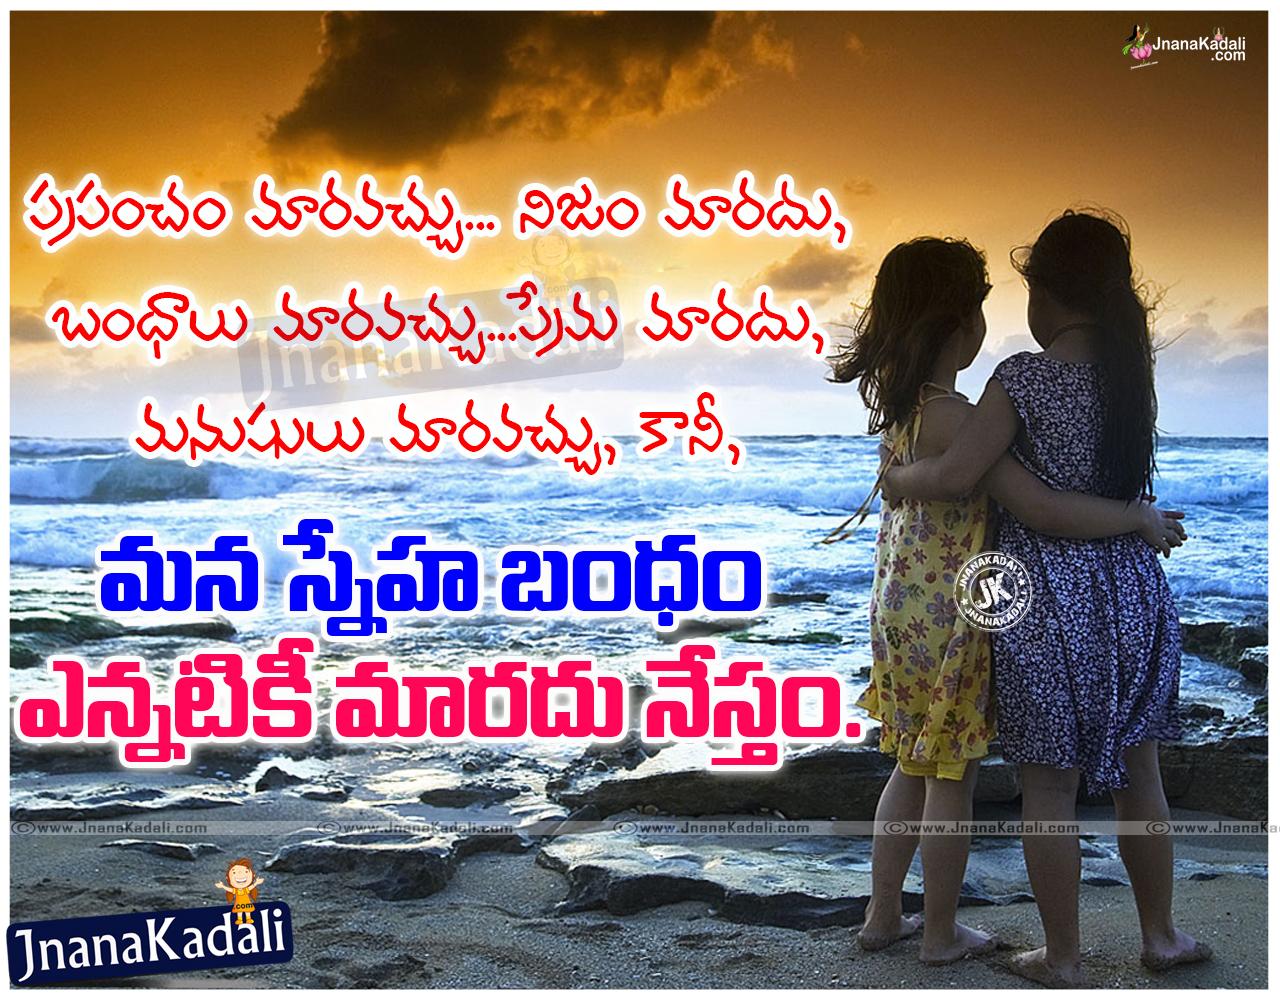 Beautiful Friendship Quotes In Telugu Language | Daily Health